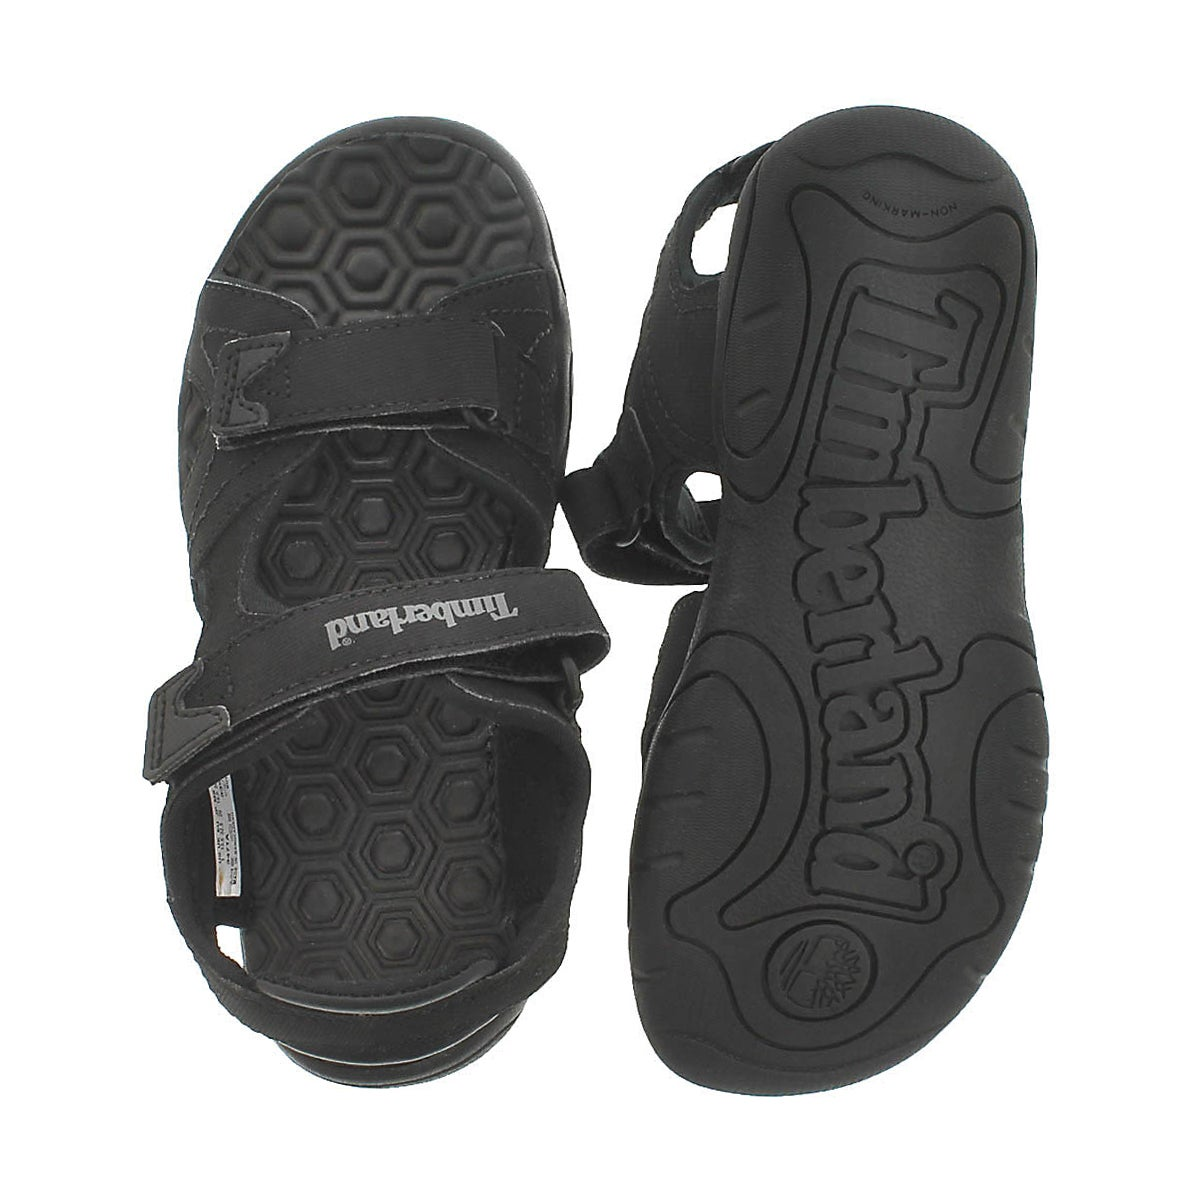 Sandale noir ADVENTURE SEEKER, gar